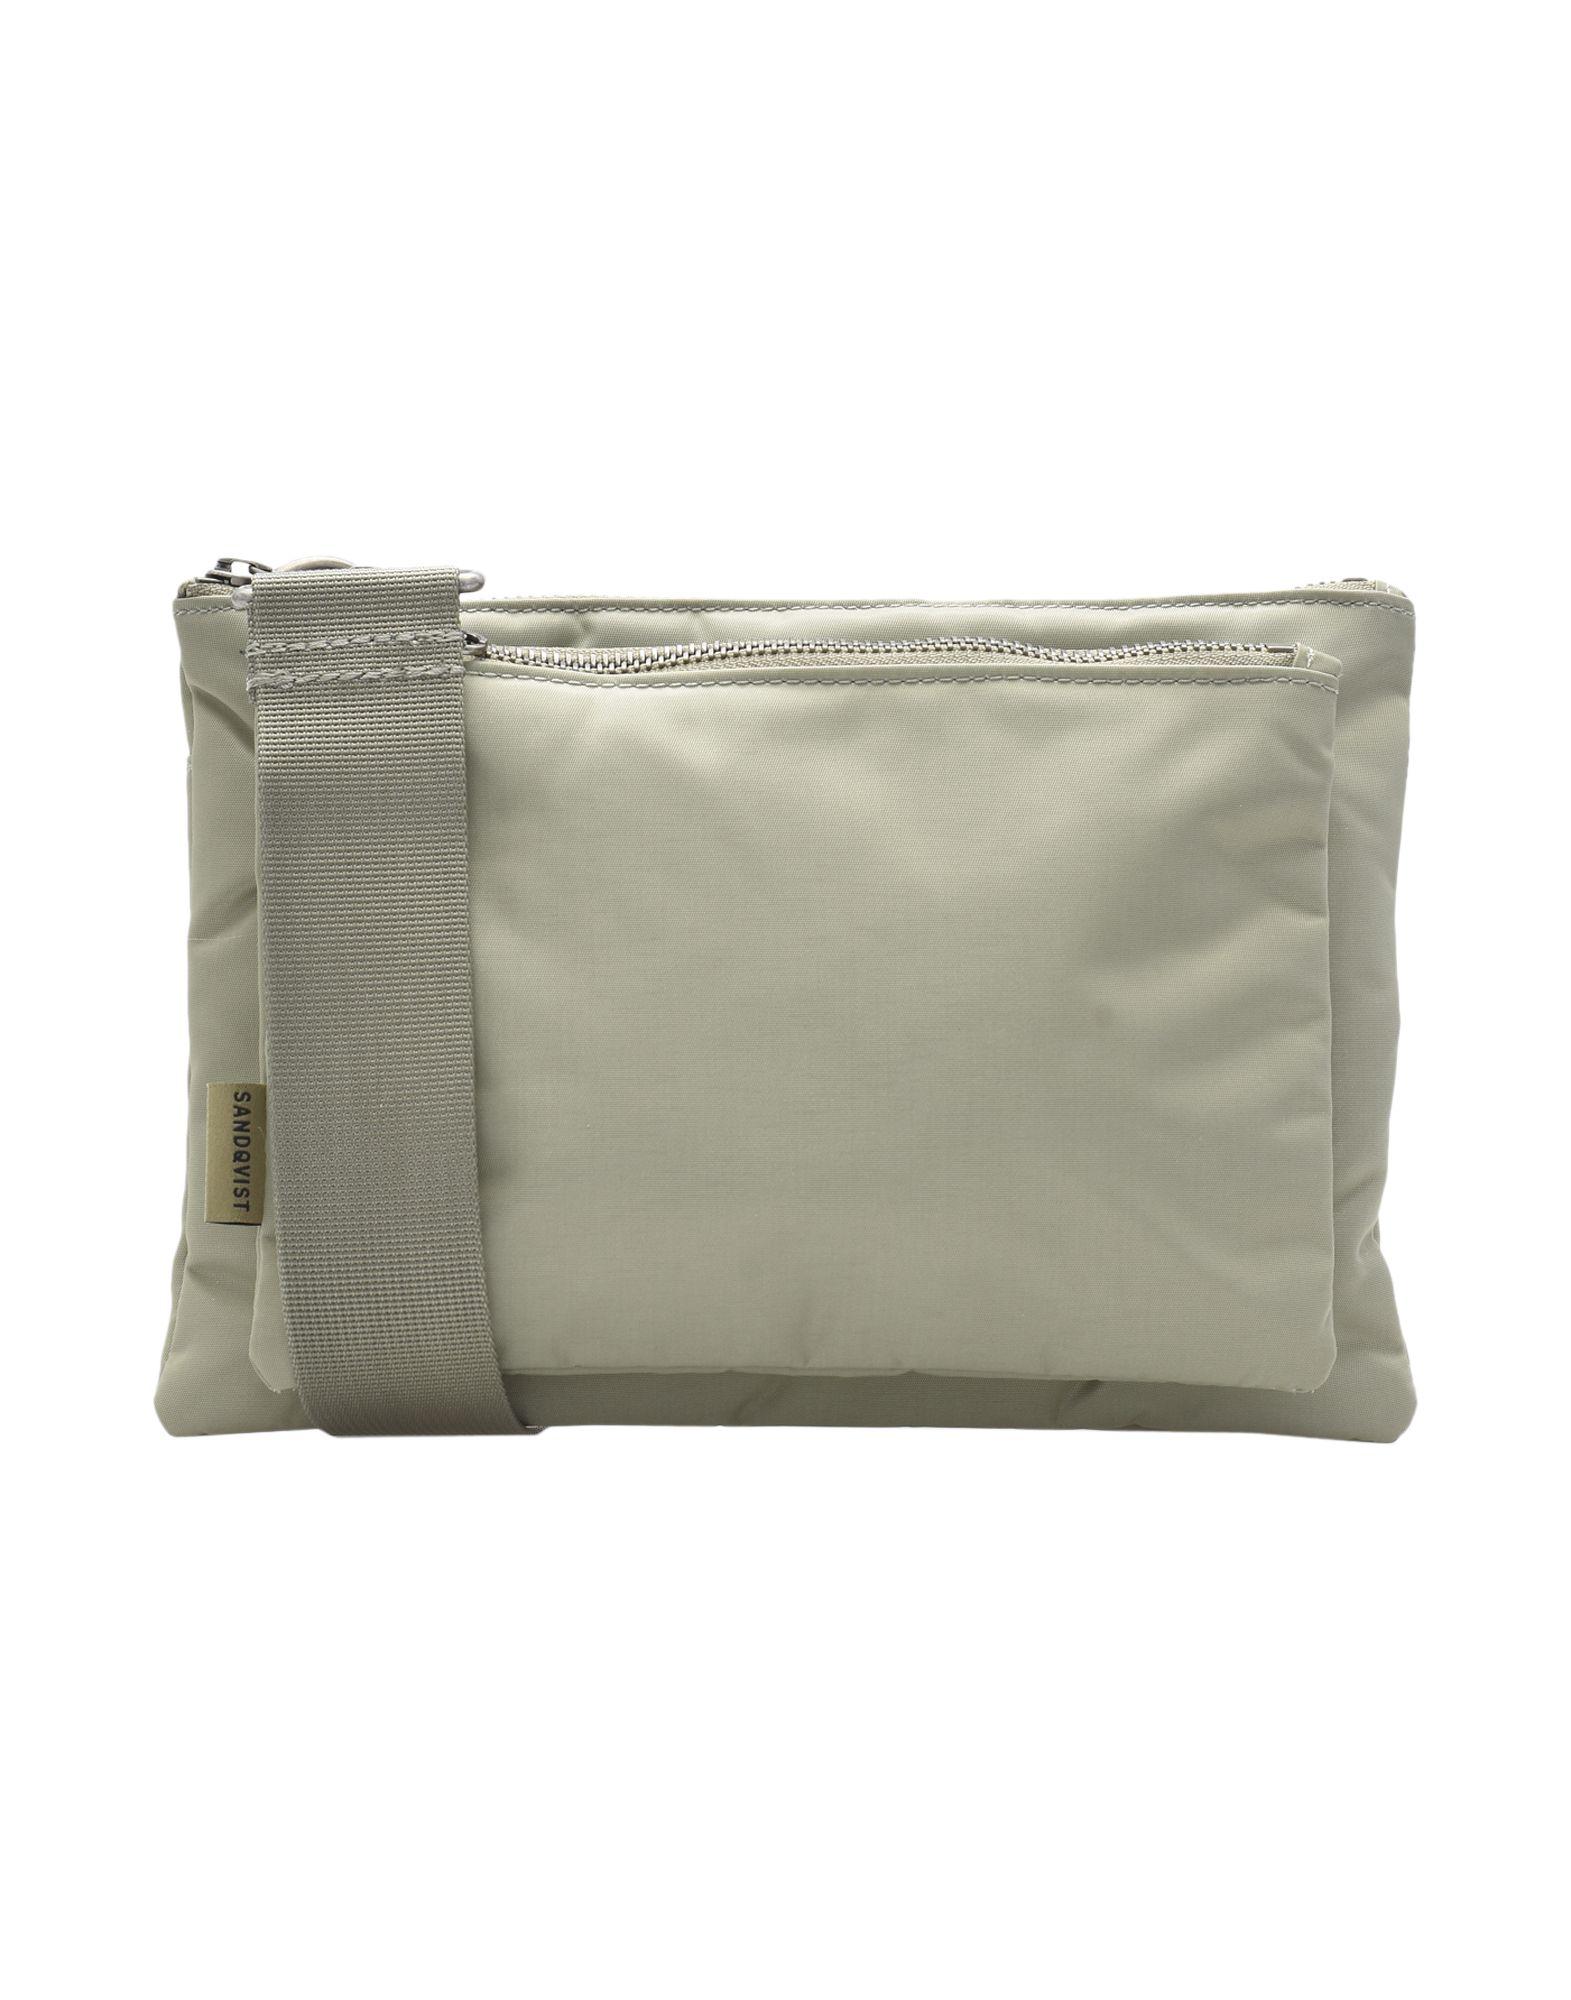 SANDQVIST Cross-Body Bags in Military Green